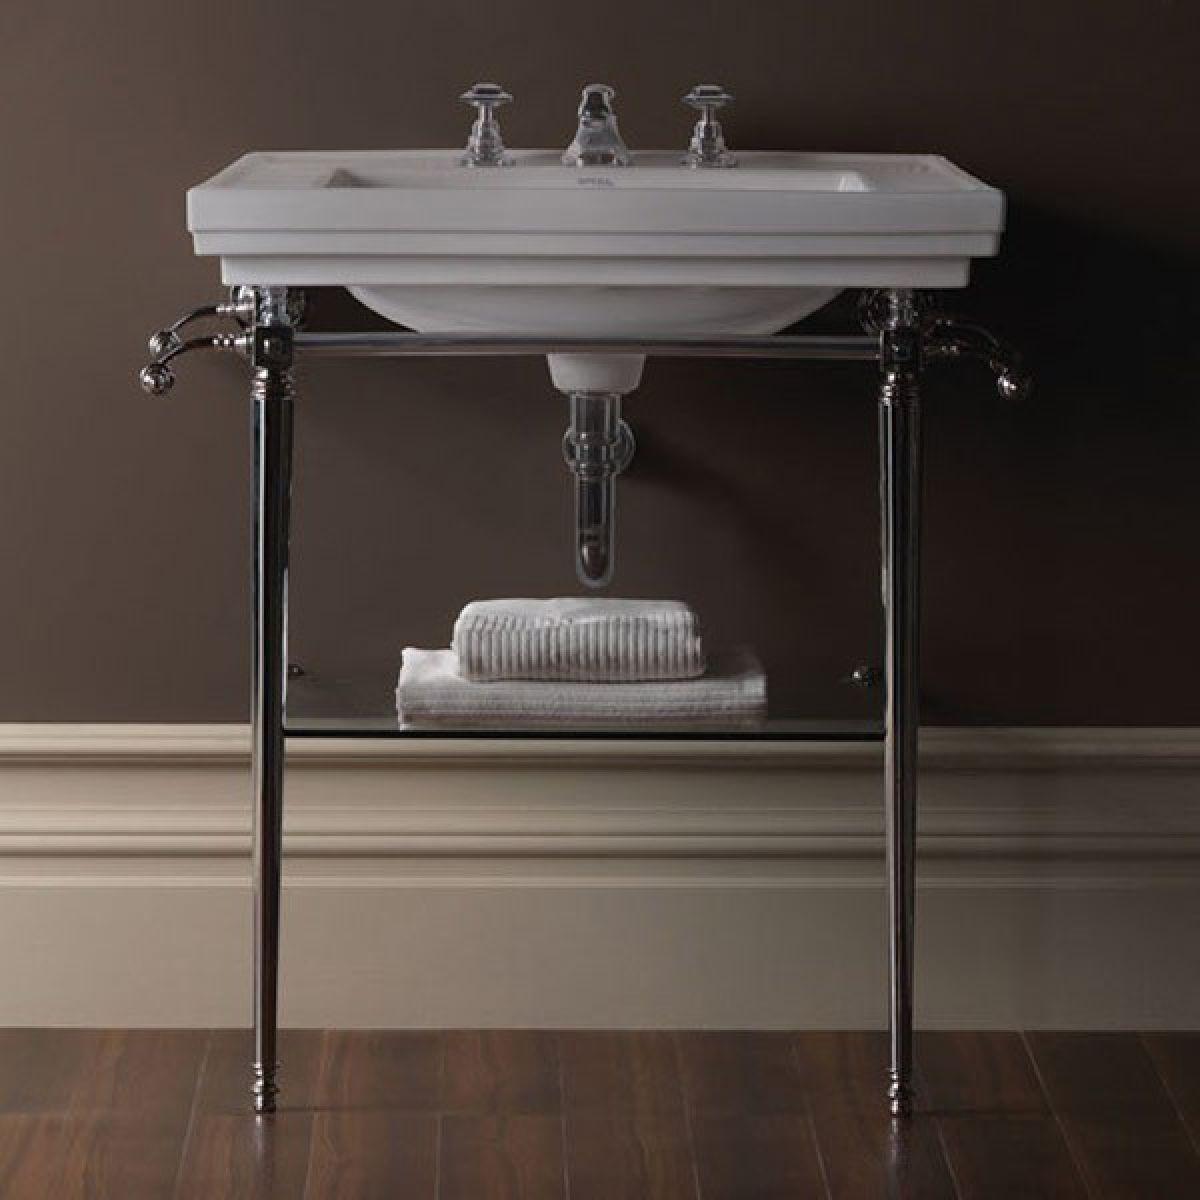 Rohl Deco Pedestal Sink Google Search Vintage Bathroom Sinks Bathroom Console Bathroom Sink Design